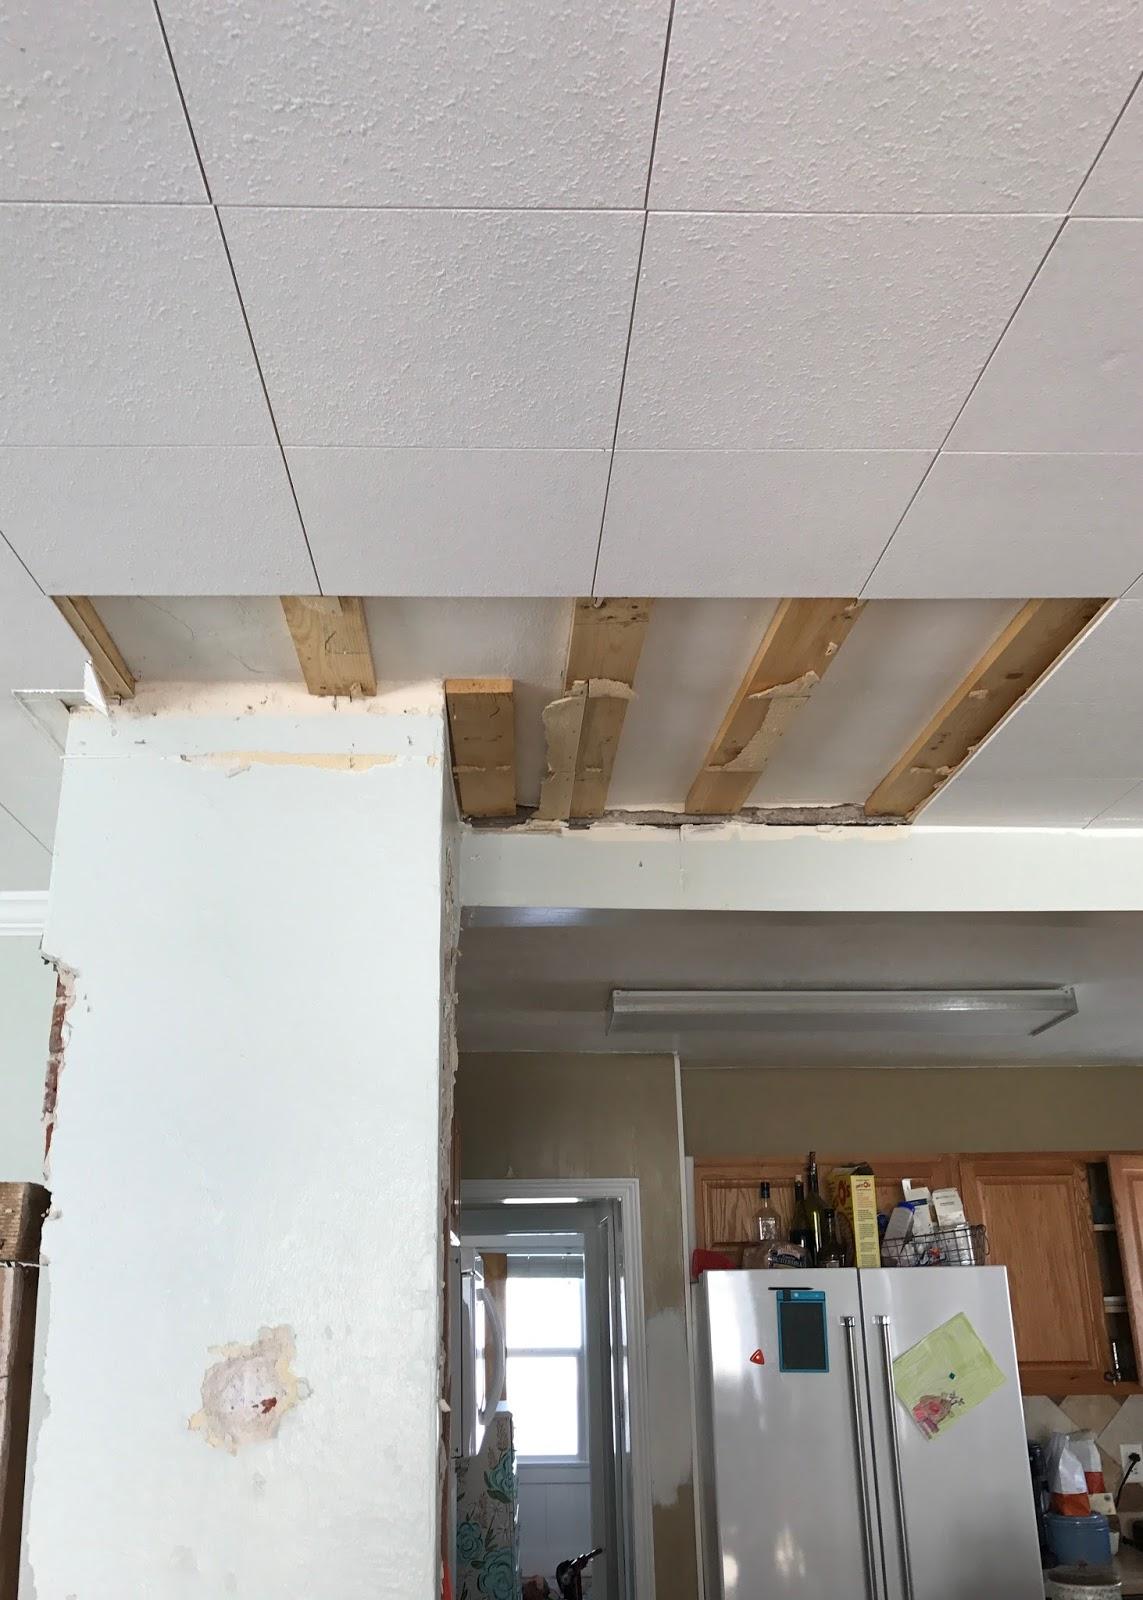 Farmhouse ceiling removing ceiling tiles averie lane farmhouse ceiling removing ceiling tiles doublecrazyfo Images